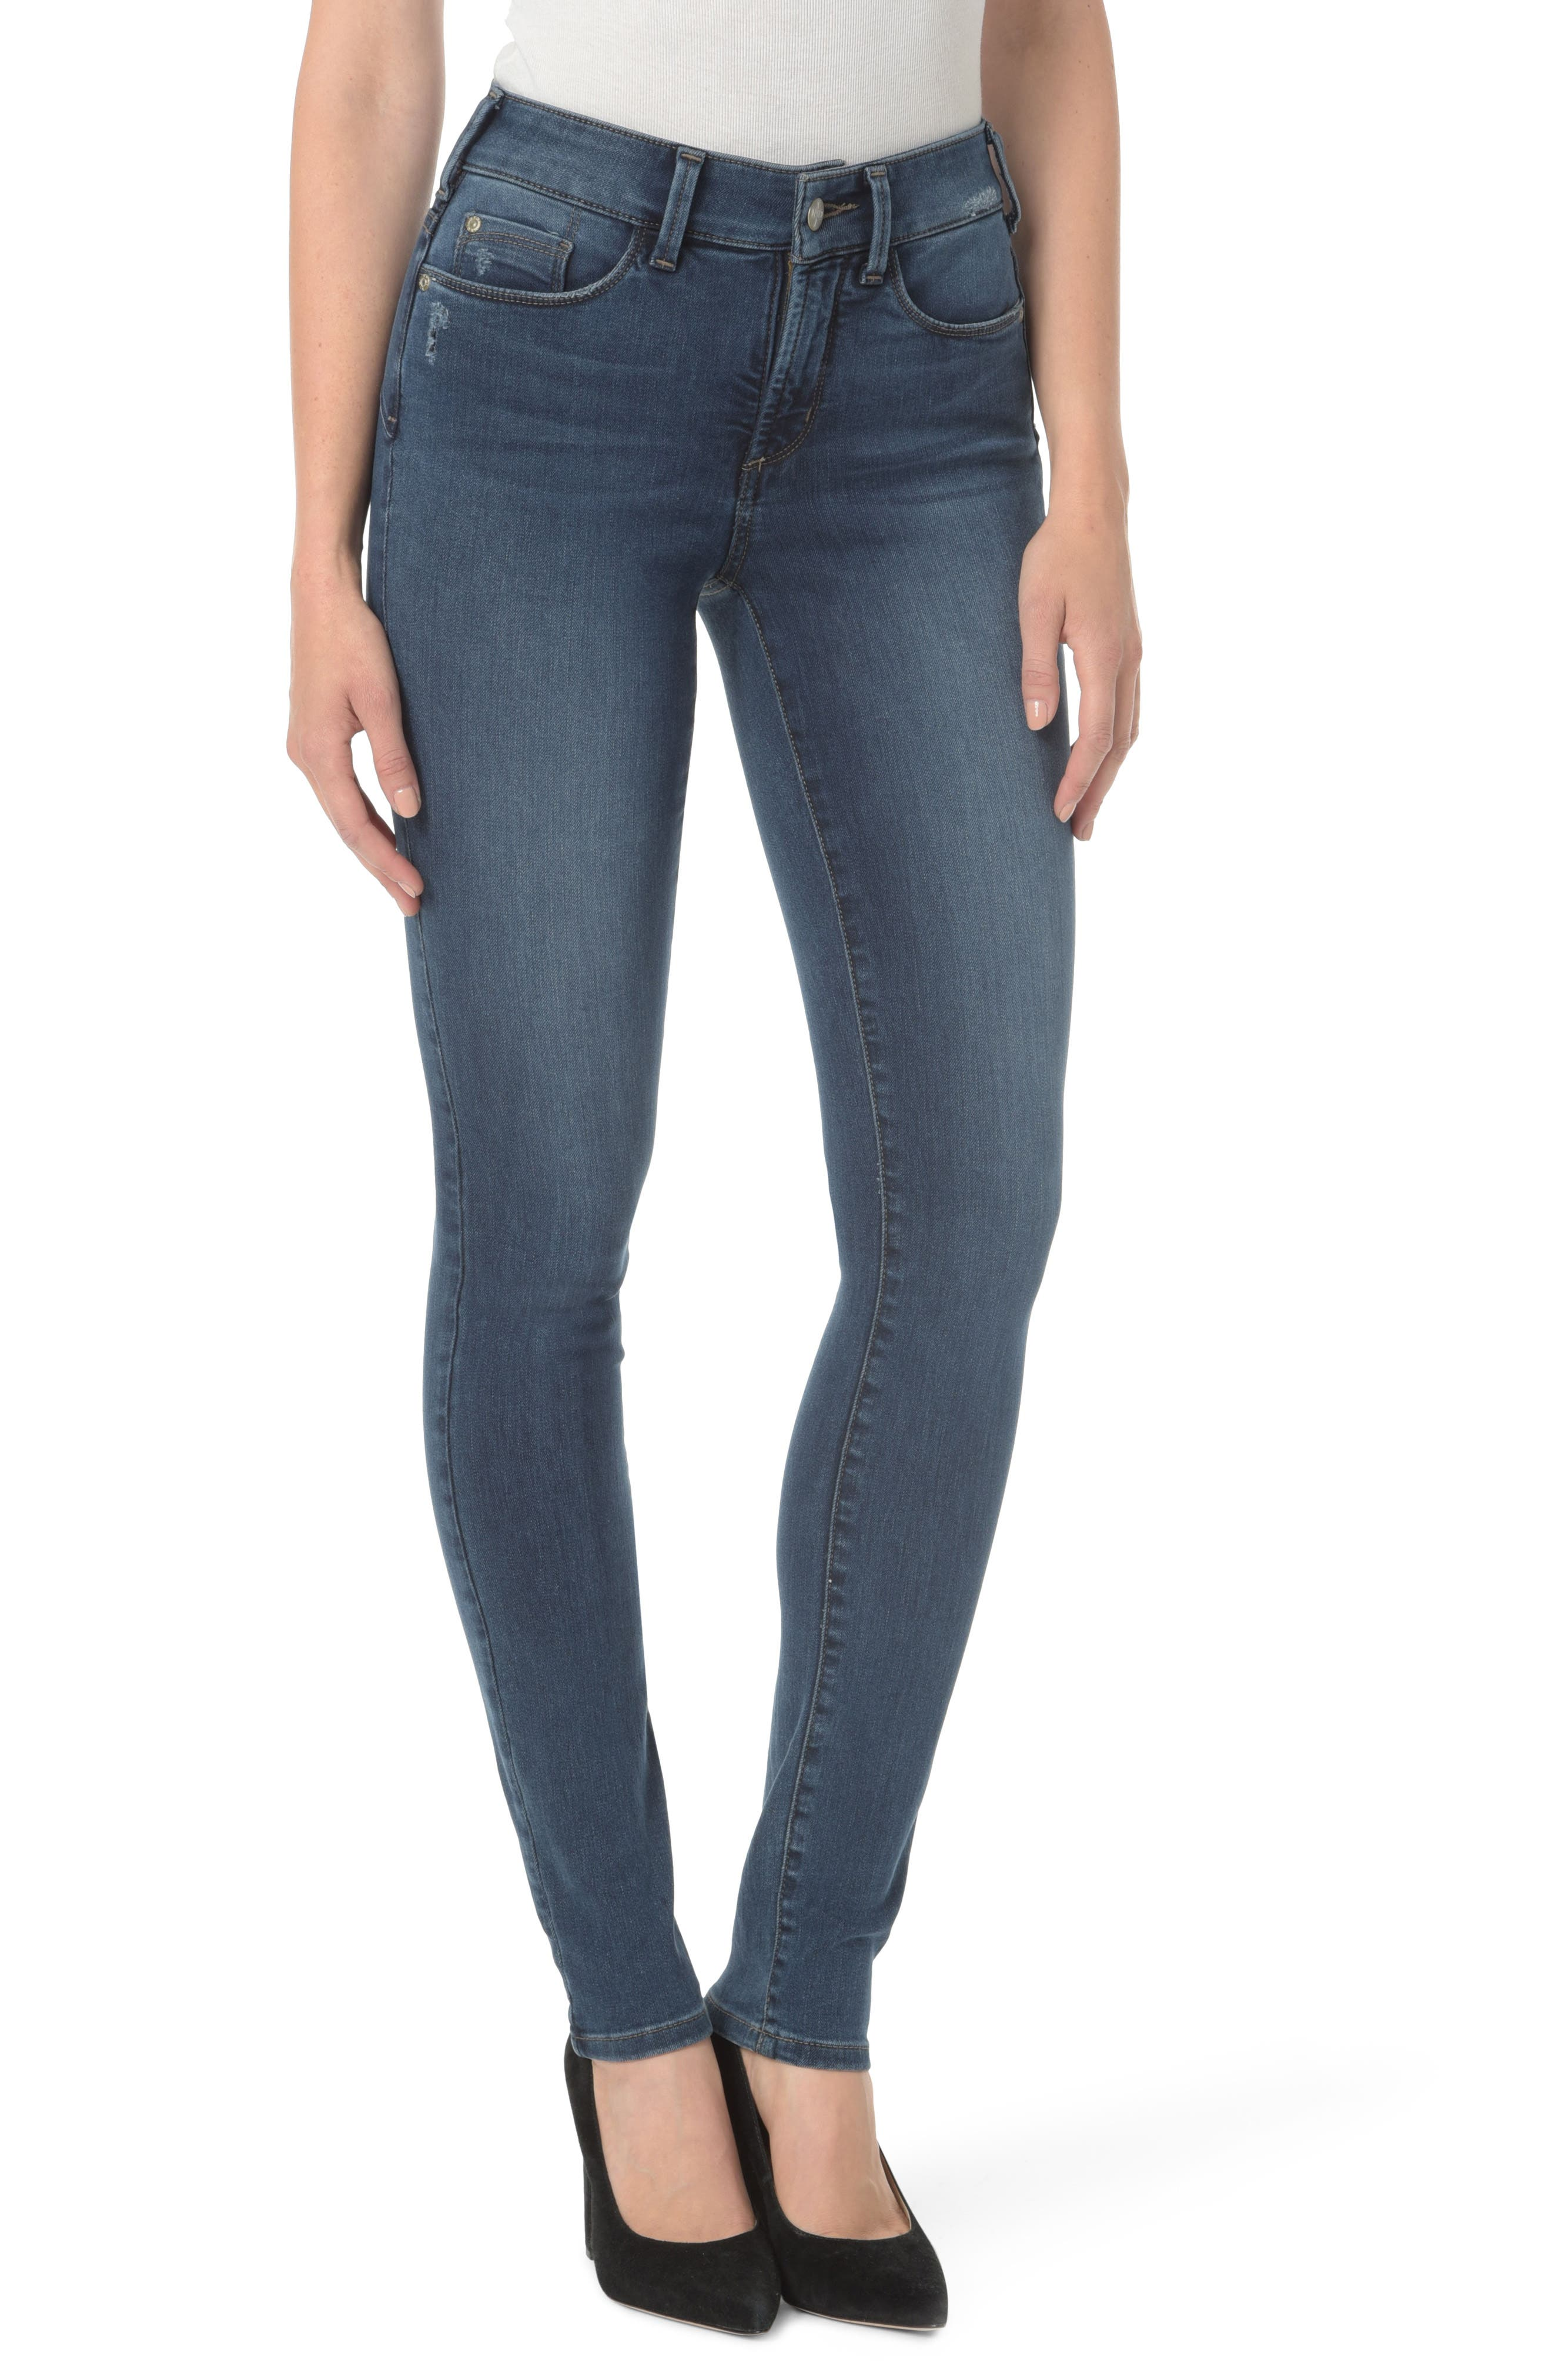 Alina Uplift Stretch Skinny Jeans,                         Main,                         color, Traveler